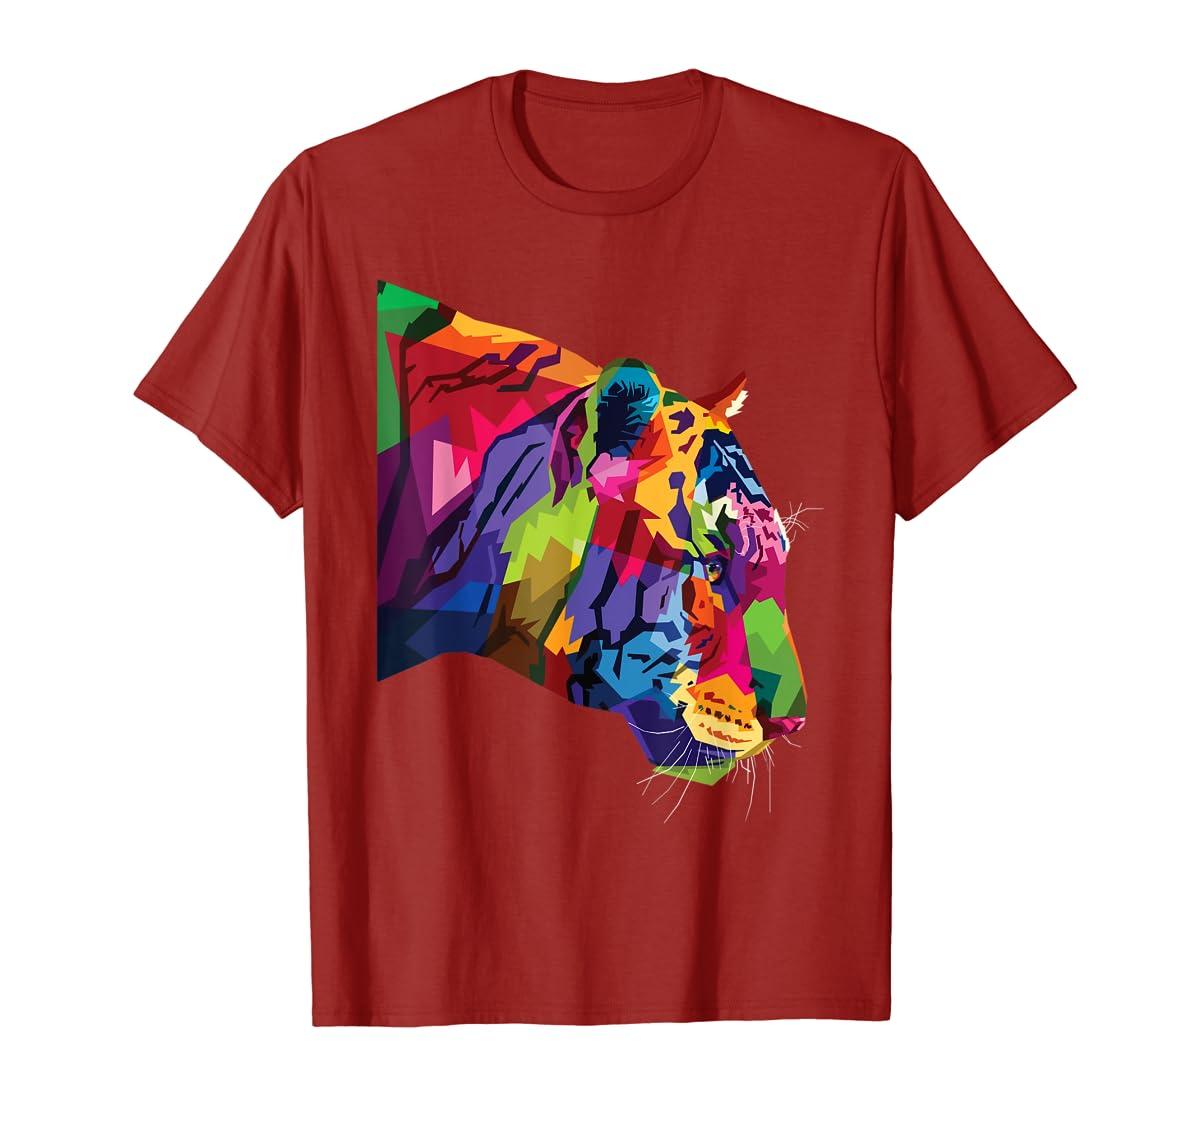 Tiger Shirt : Colorful Tiger's head Pop Art Style T-Shirt-Men's T-Shirt-Red